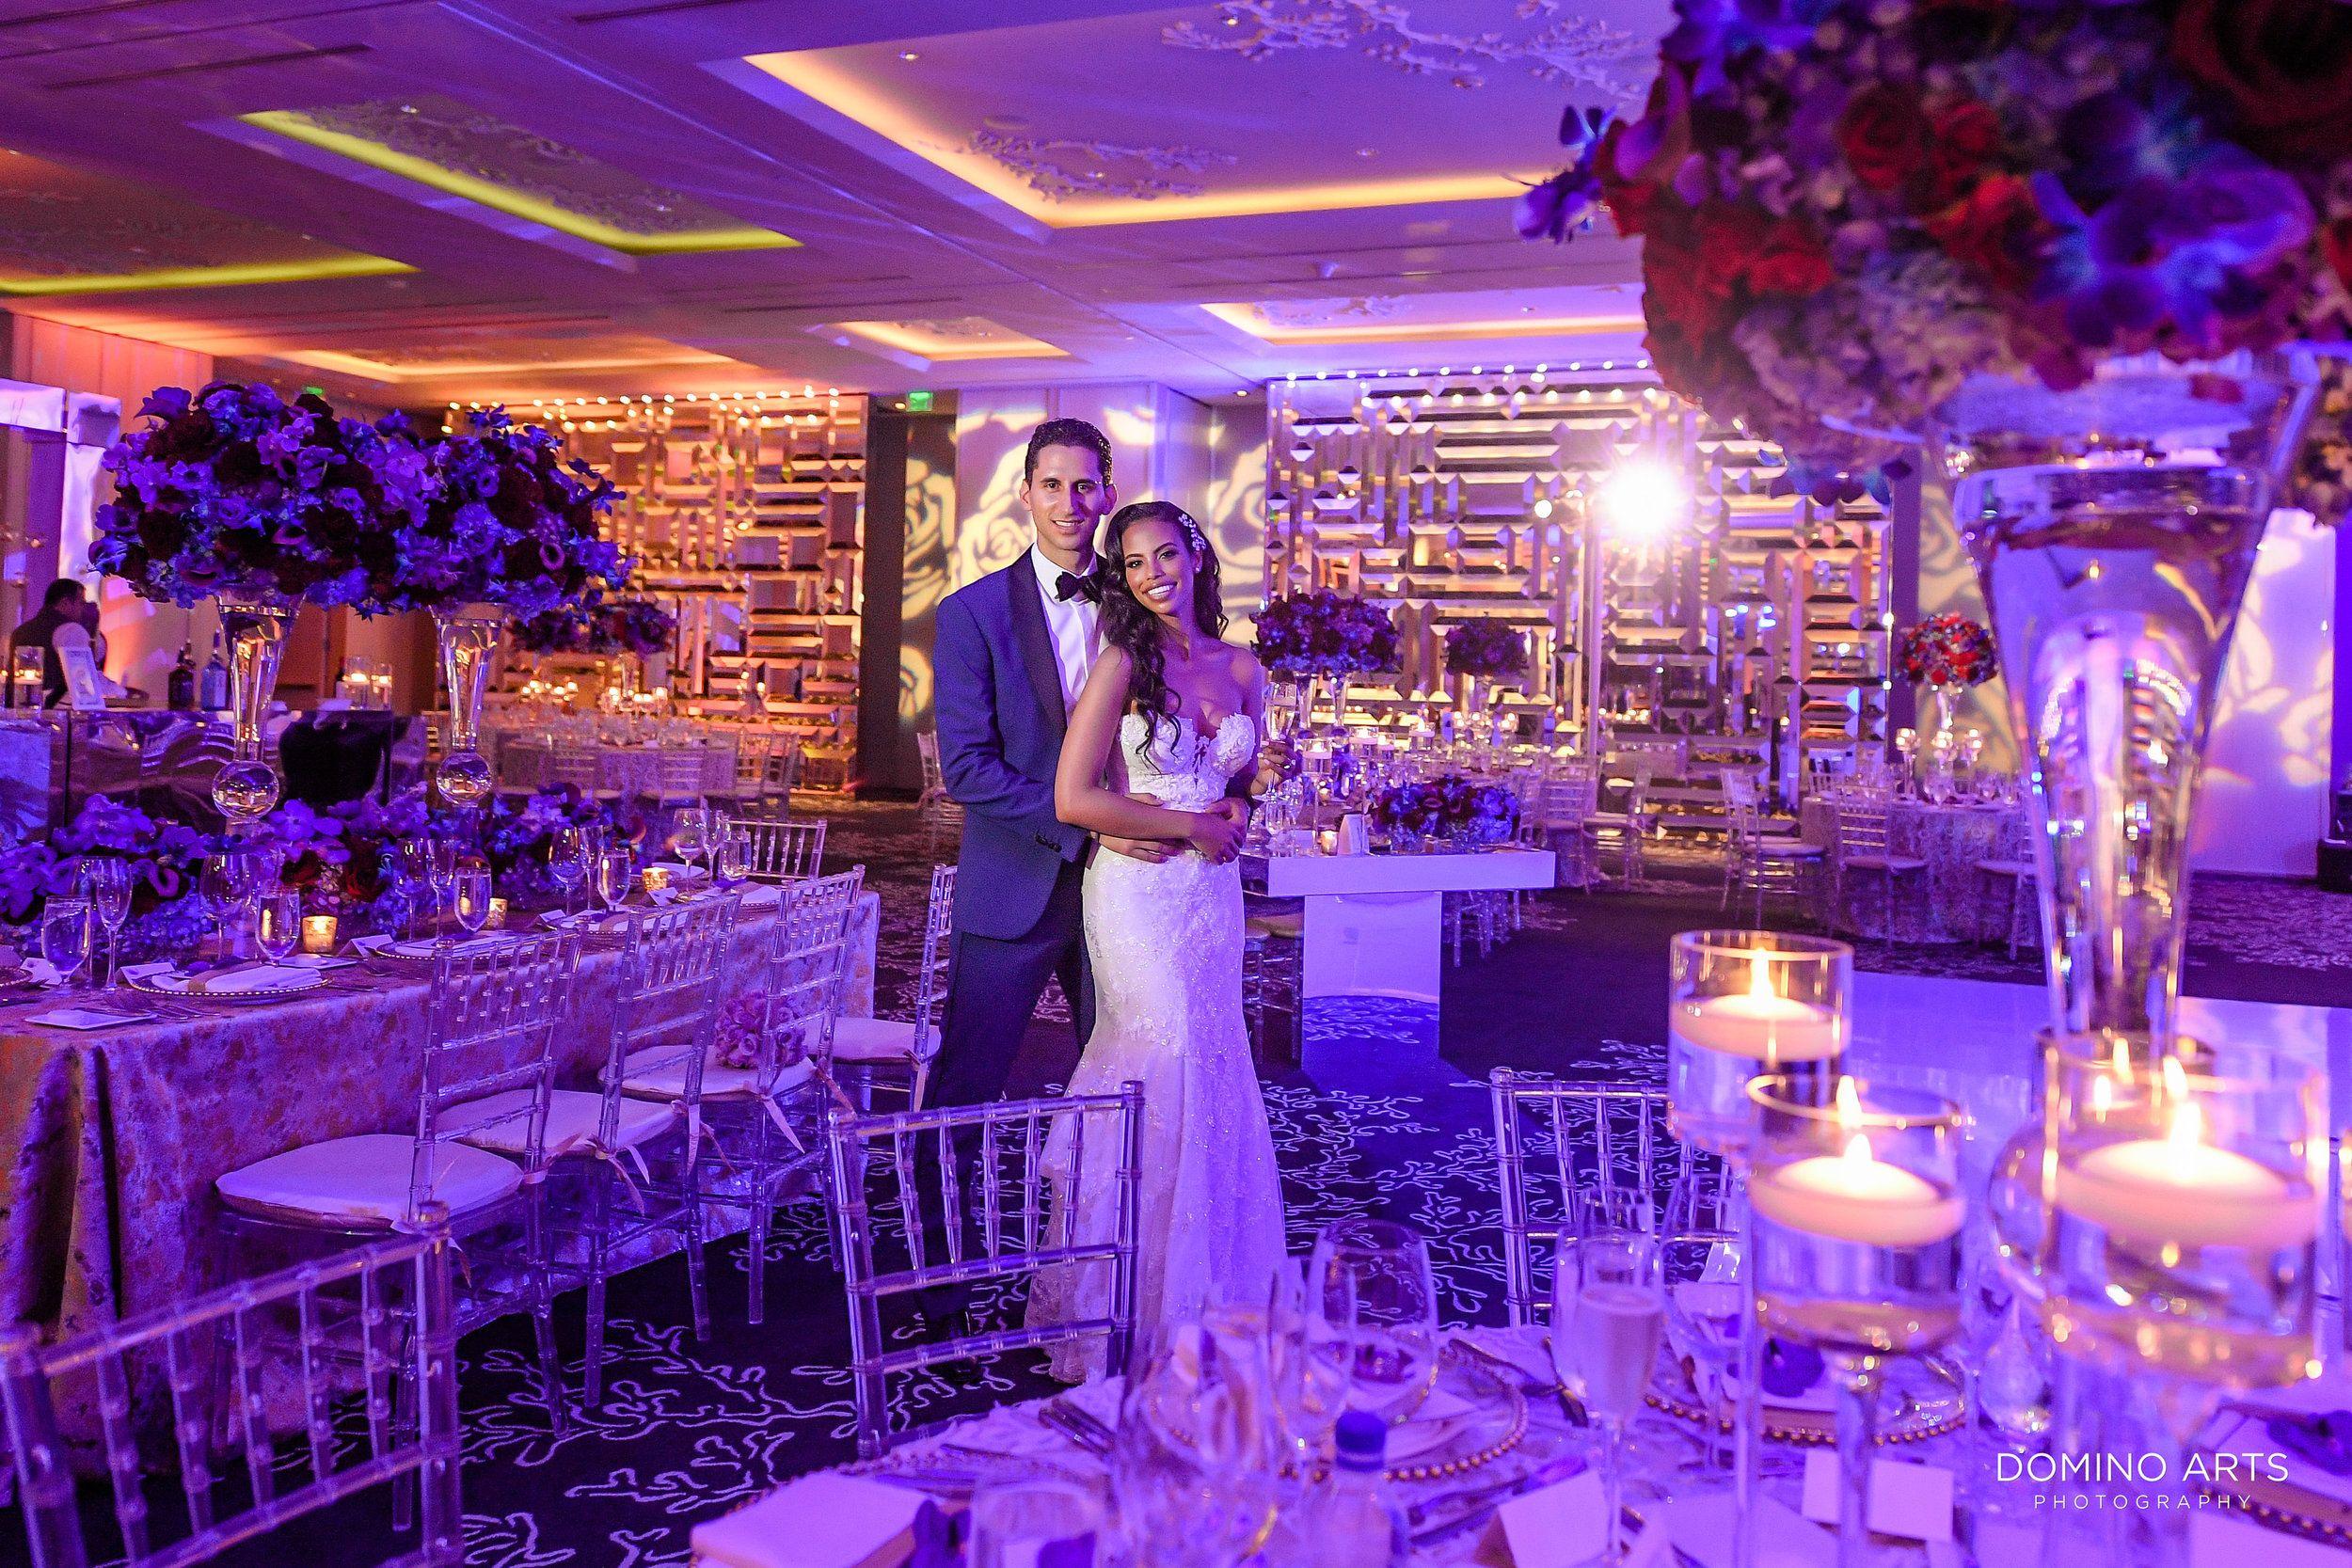 Galia Lahav Bridal Gown at Little White Dress Bridal Shop